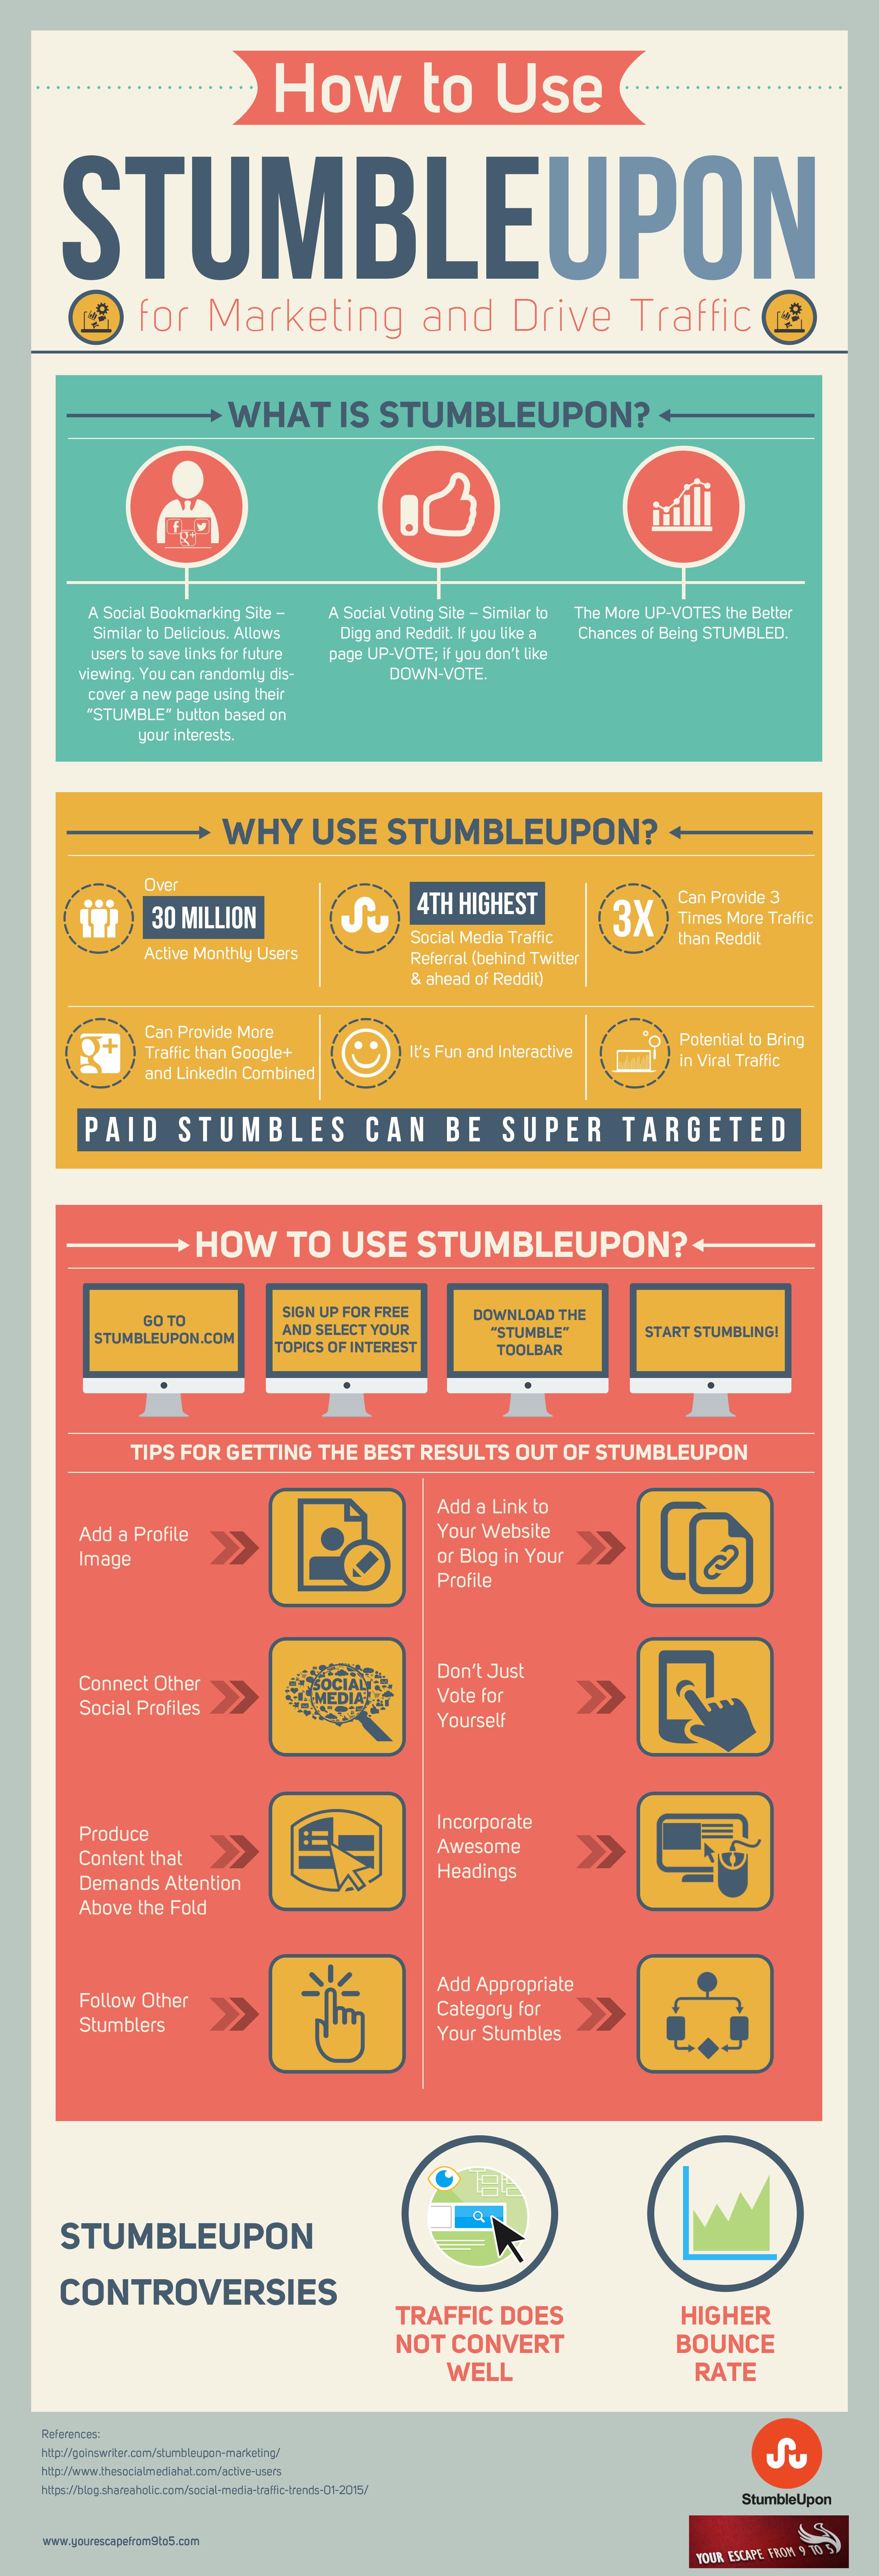 Why Use StumbleUpon: The Social Media Underdog